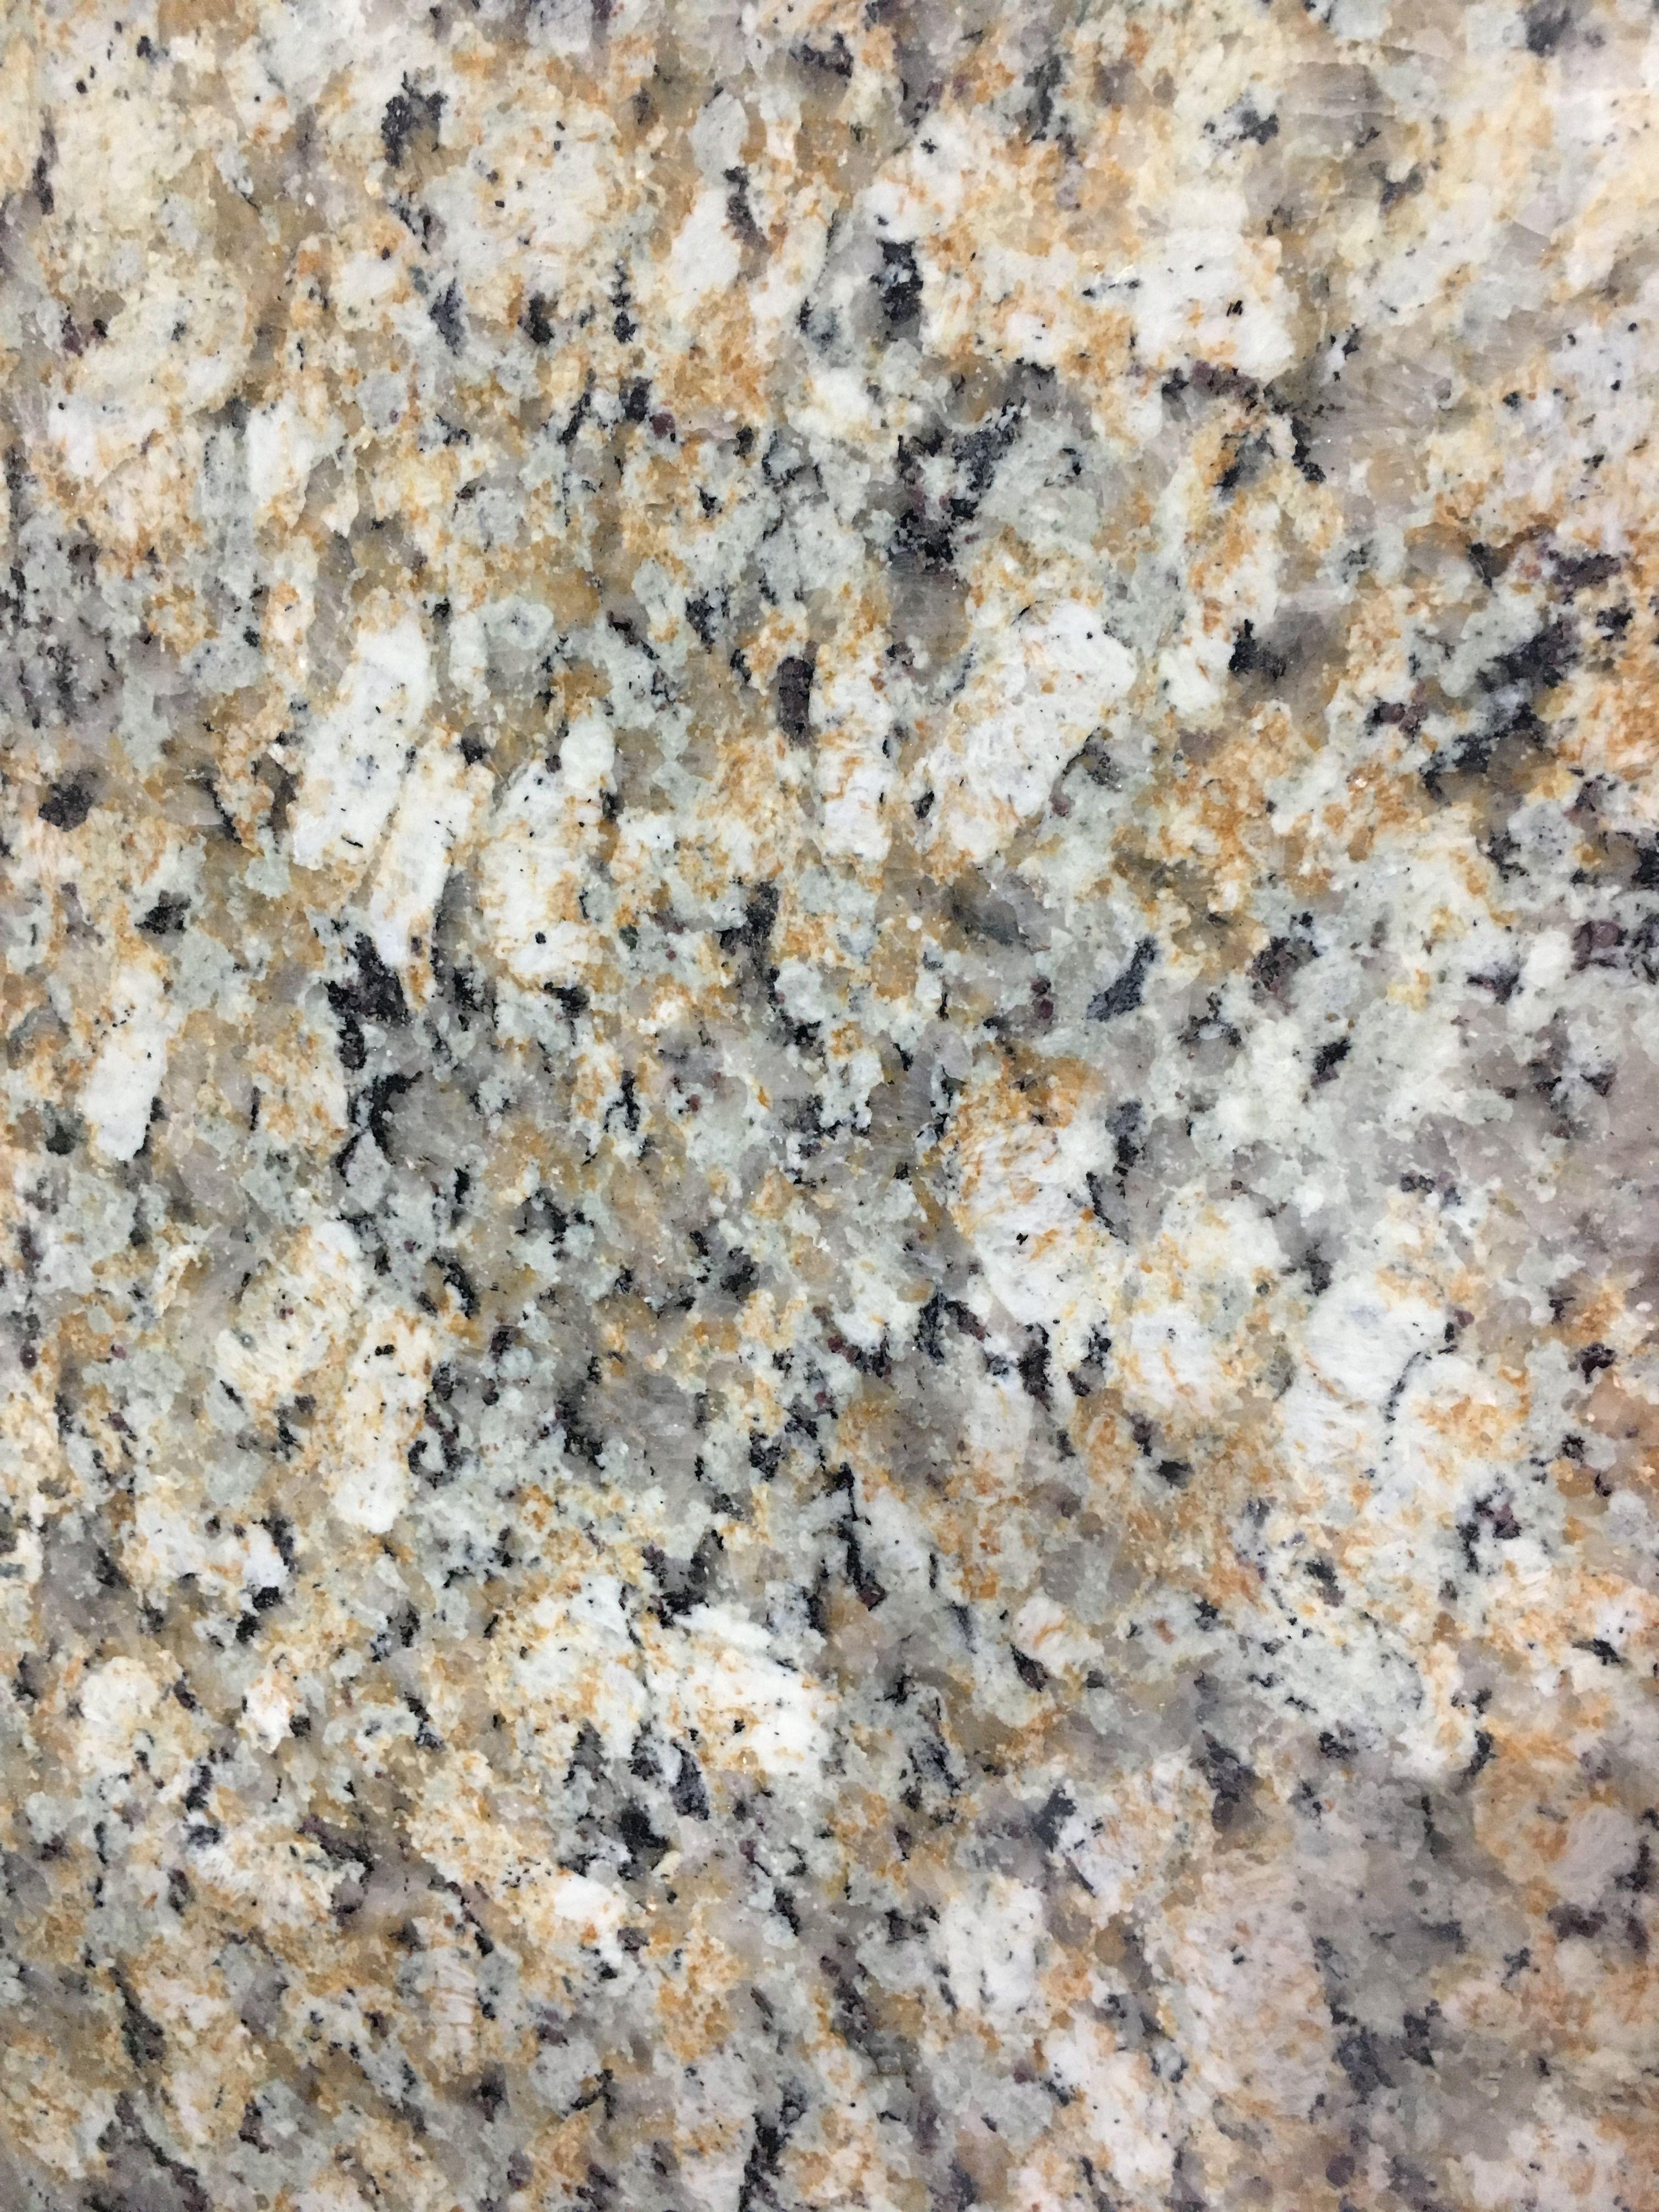 Giallo Napoleon Granite From Brazil Granite Countertops Granite Granite Stone